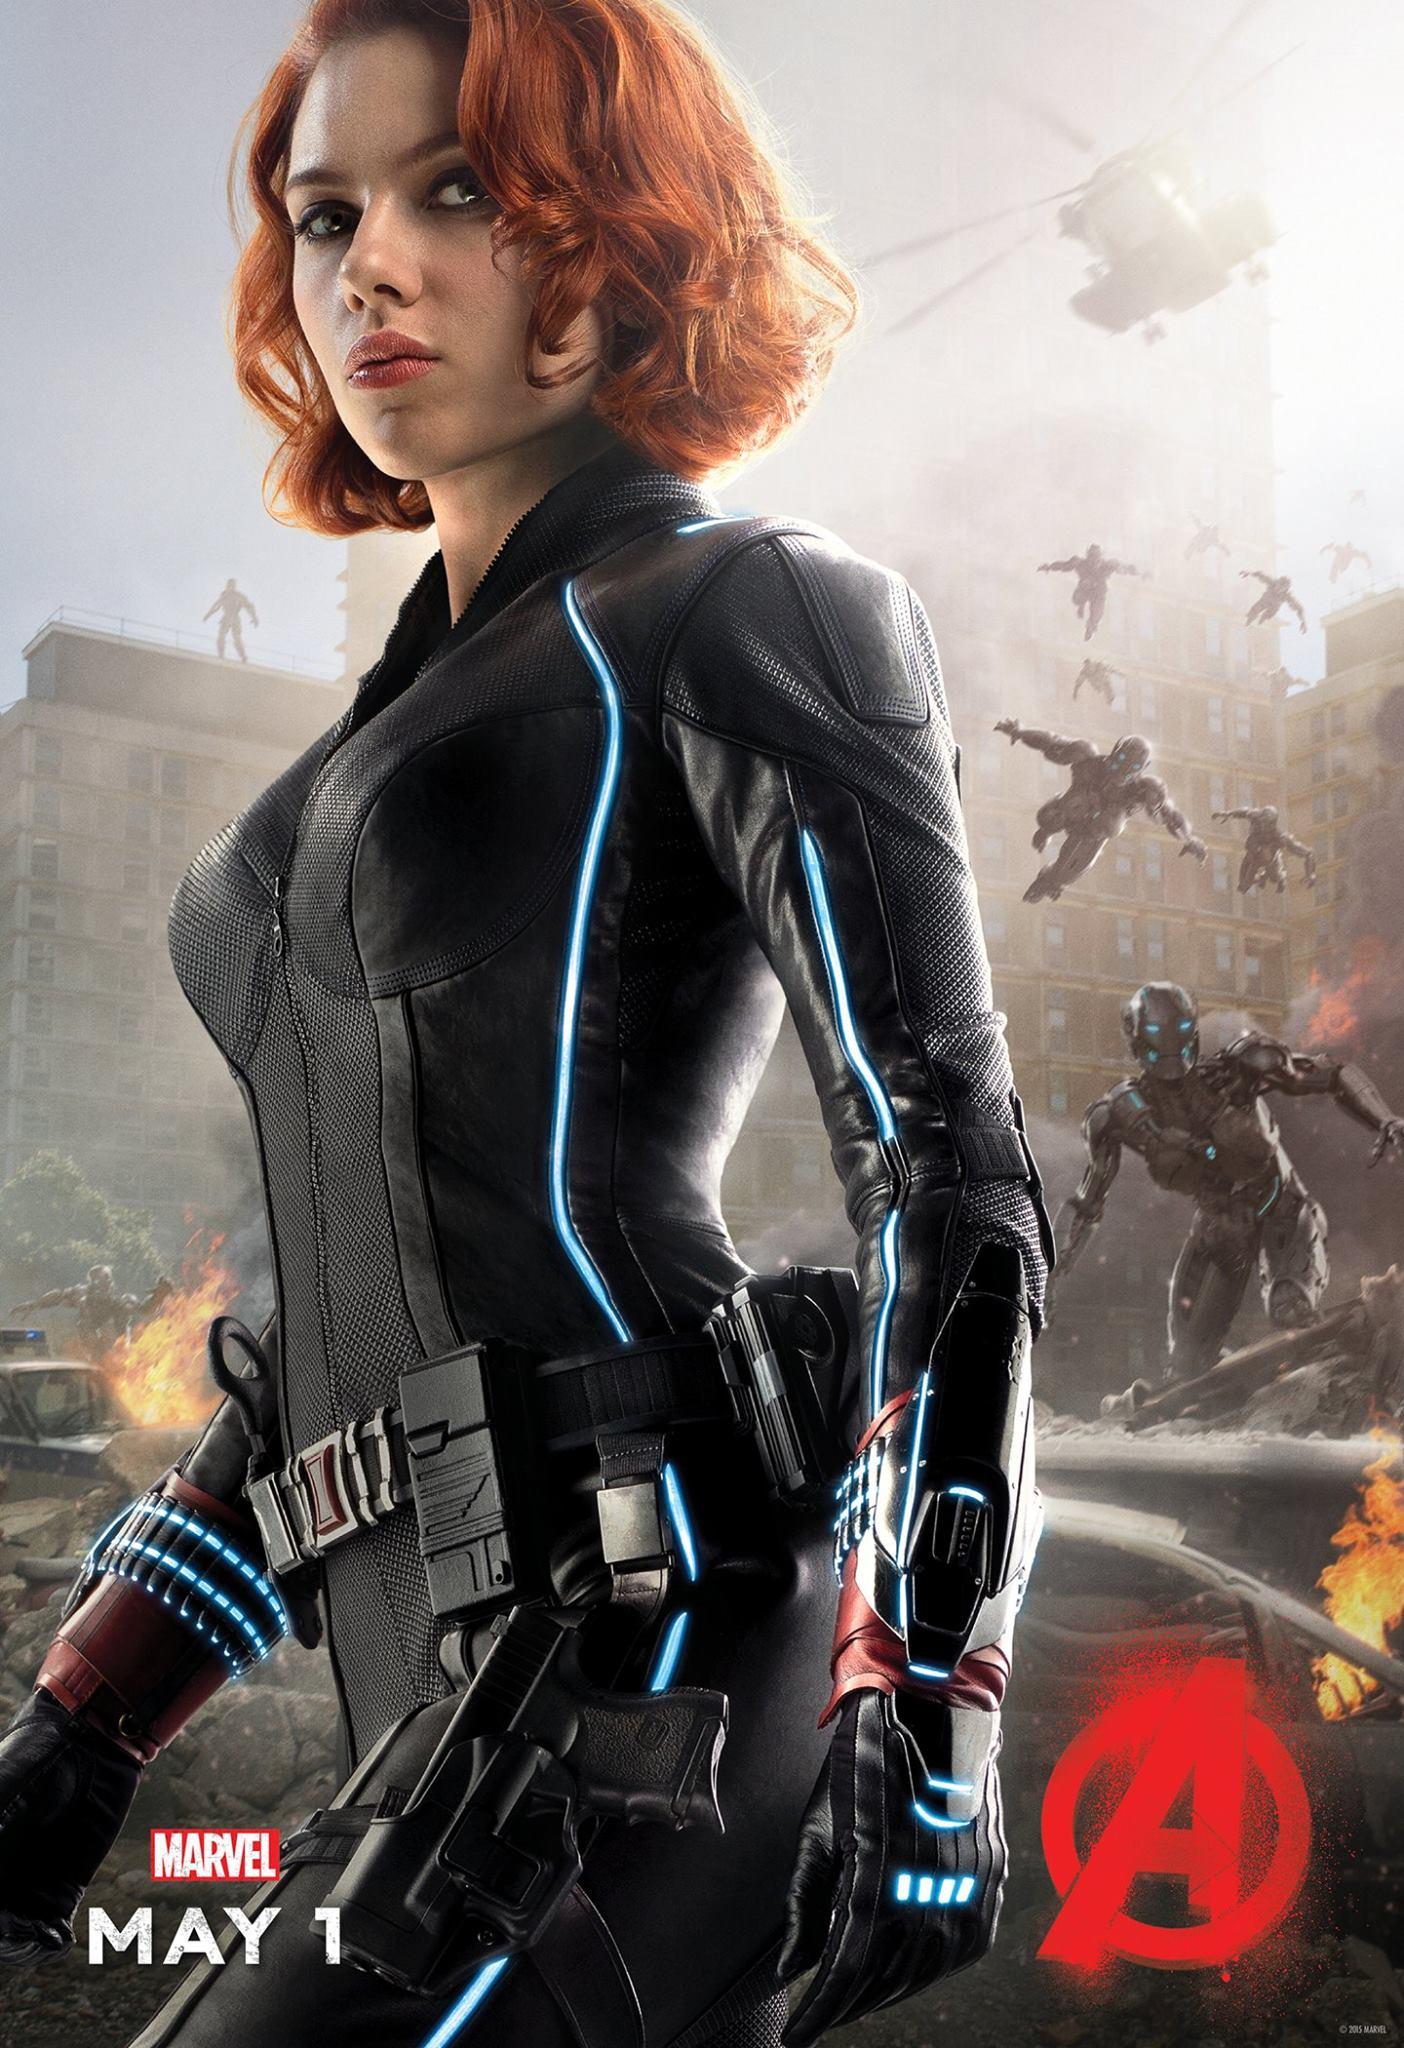 Avengers-Age-of-Ultron-Black-Widow